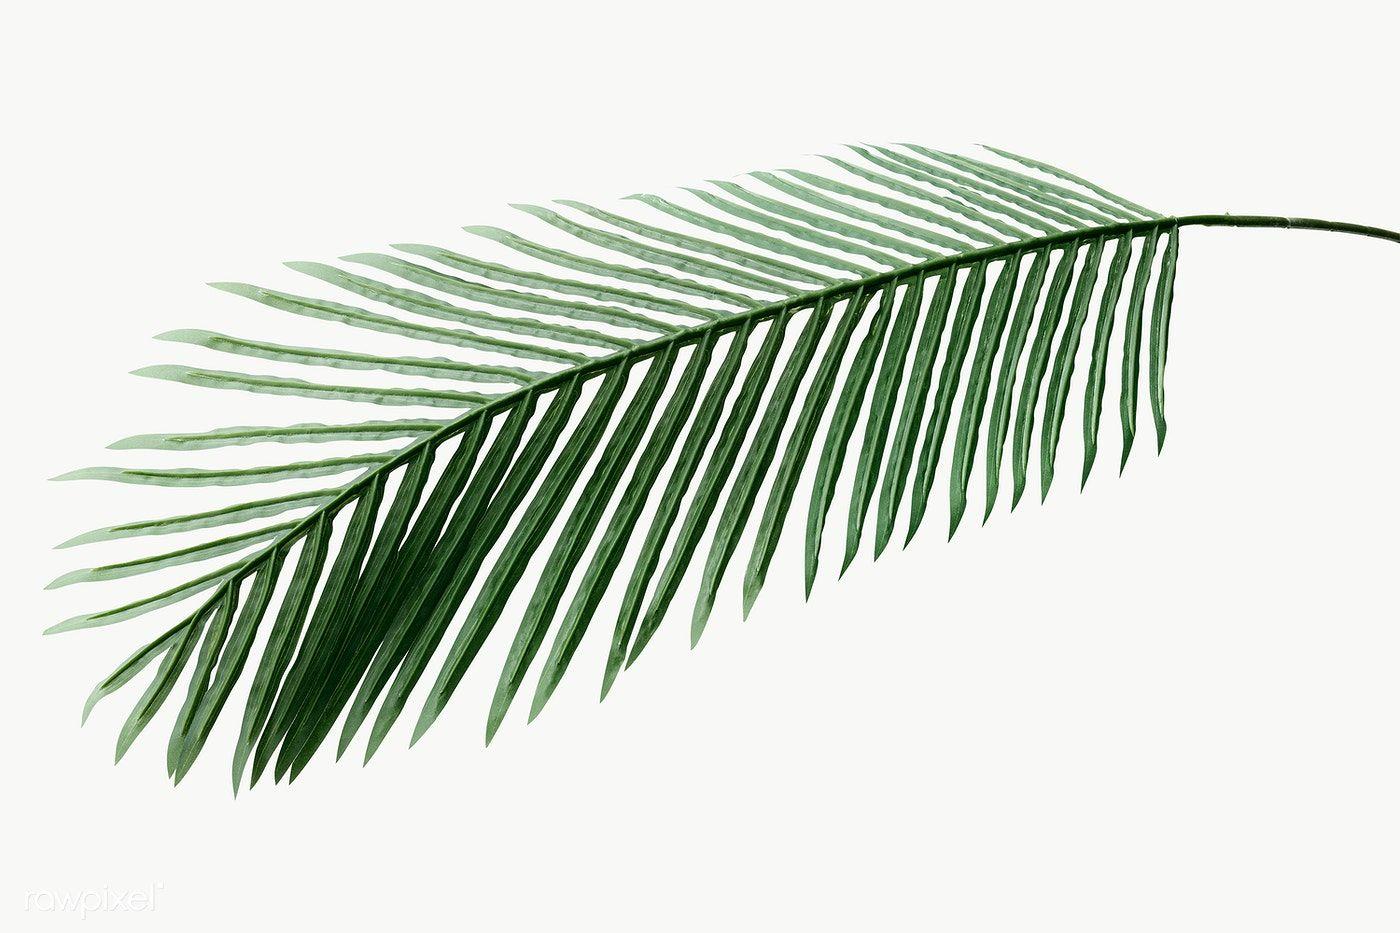 Fresh Green Areca Palm Leaf Design Element Free Image By Rawpixel Com Teddy Rawpixel In 2021 Palm Leaves Palm Leaf Design Areca Palm